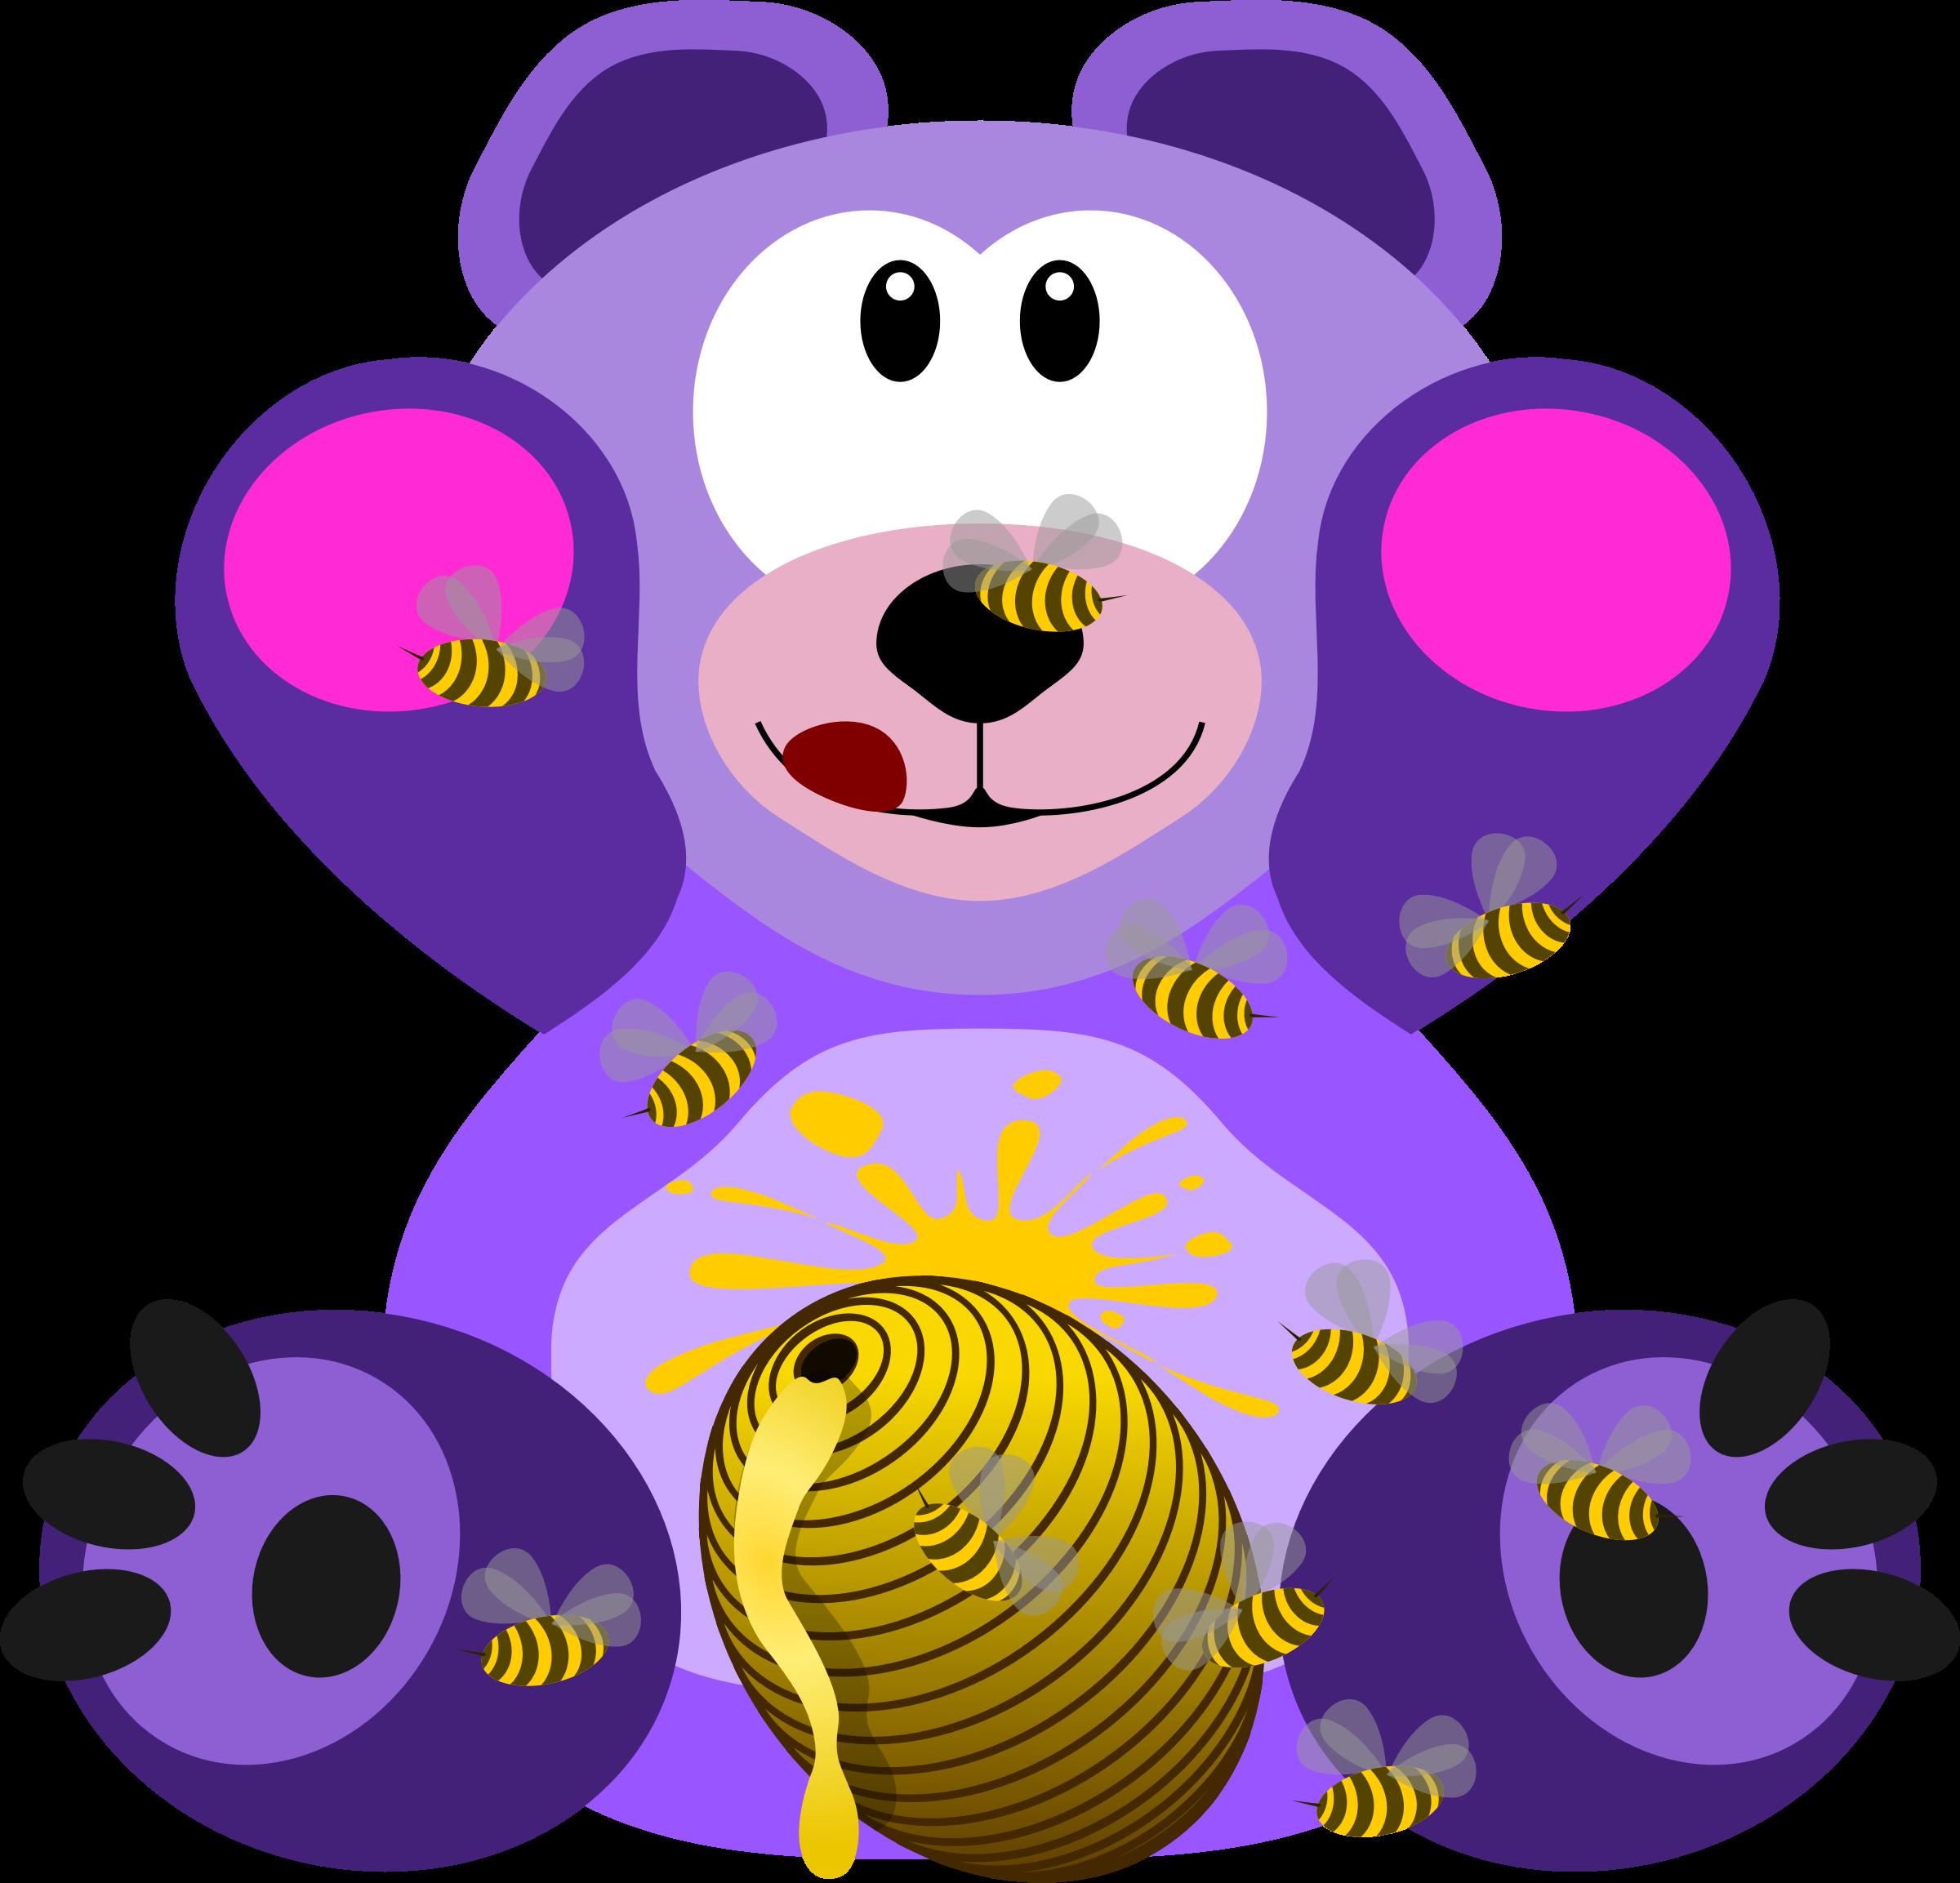 Diabetes clipart peace love. Diabetic teddy bear big